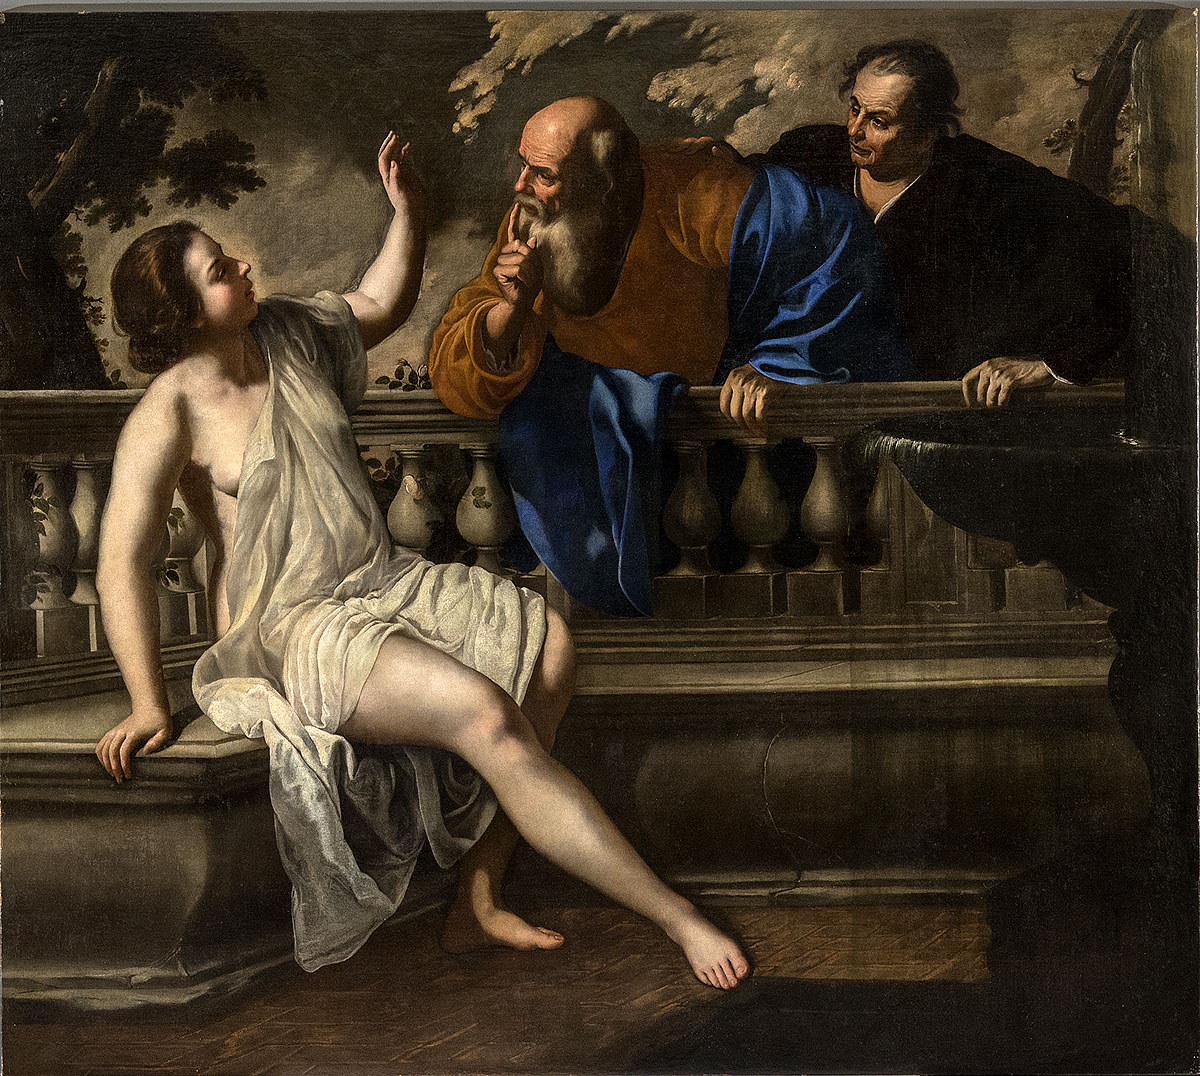 Artemisia Gentileschi, 'Susannah and the Elders', oil on canvas, 1652 (2)